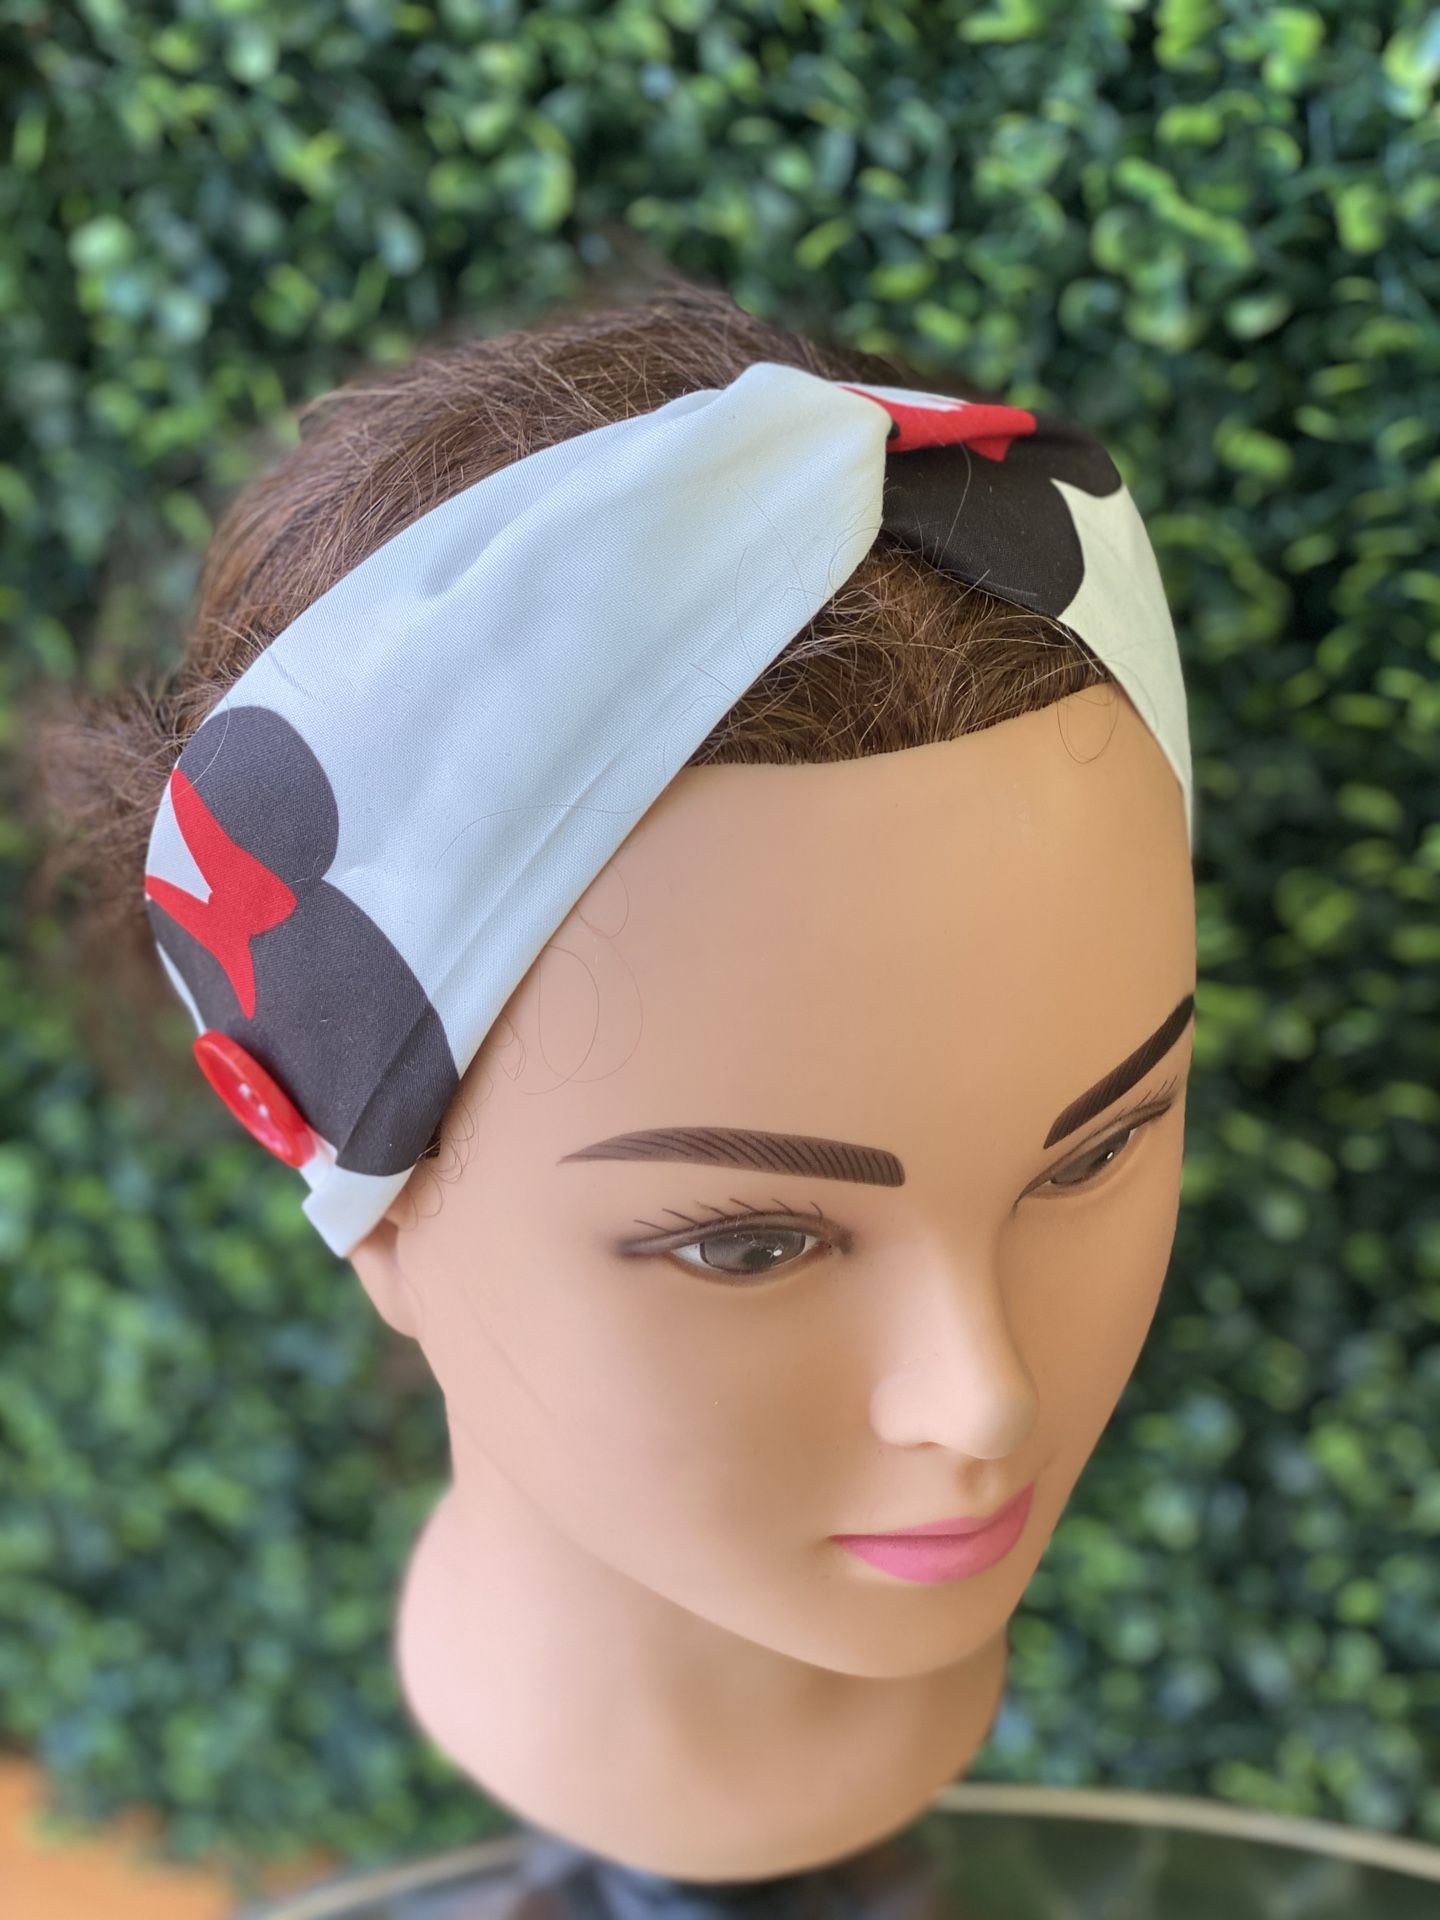 Minnie Mouse ear saver headband